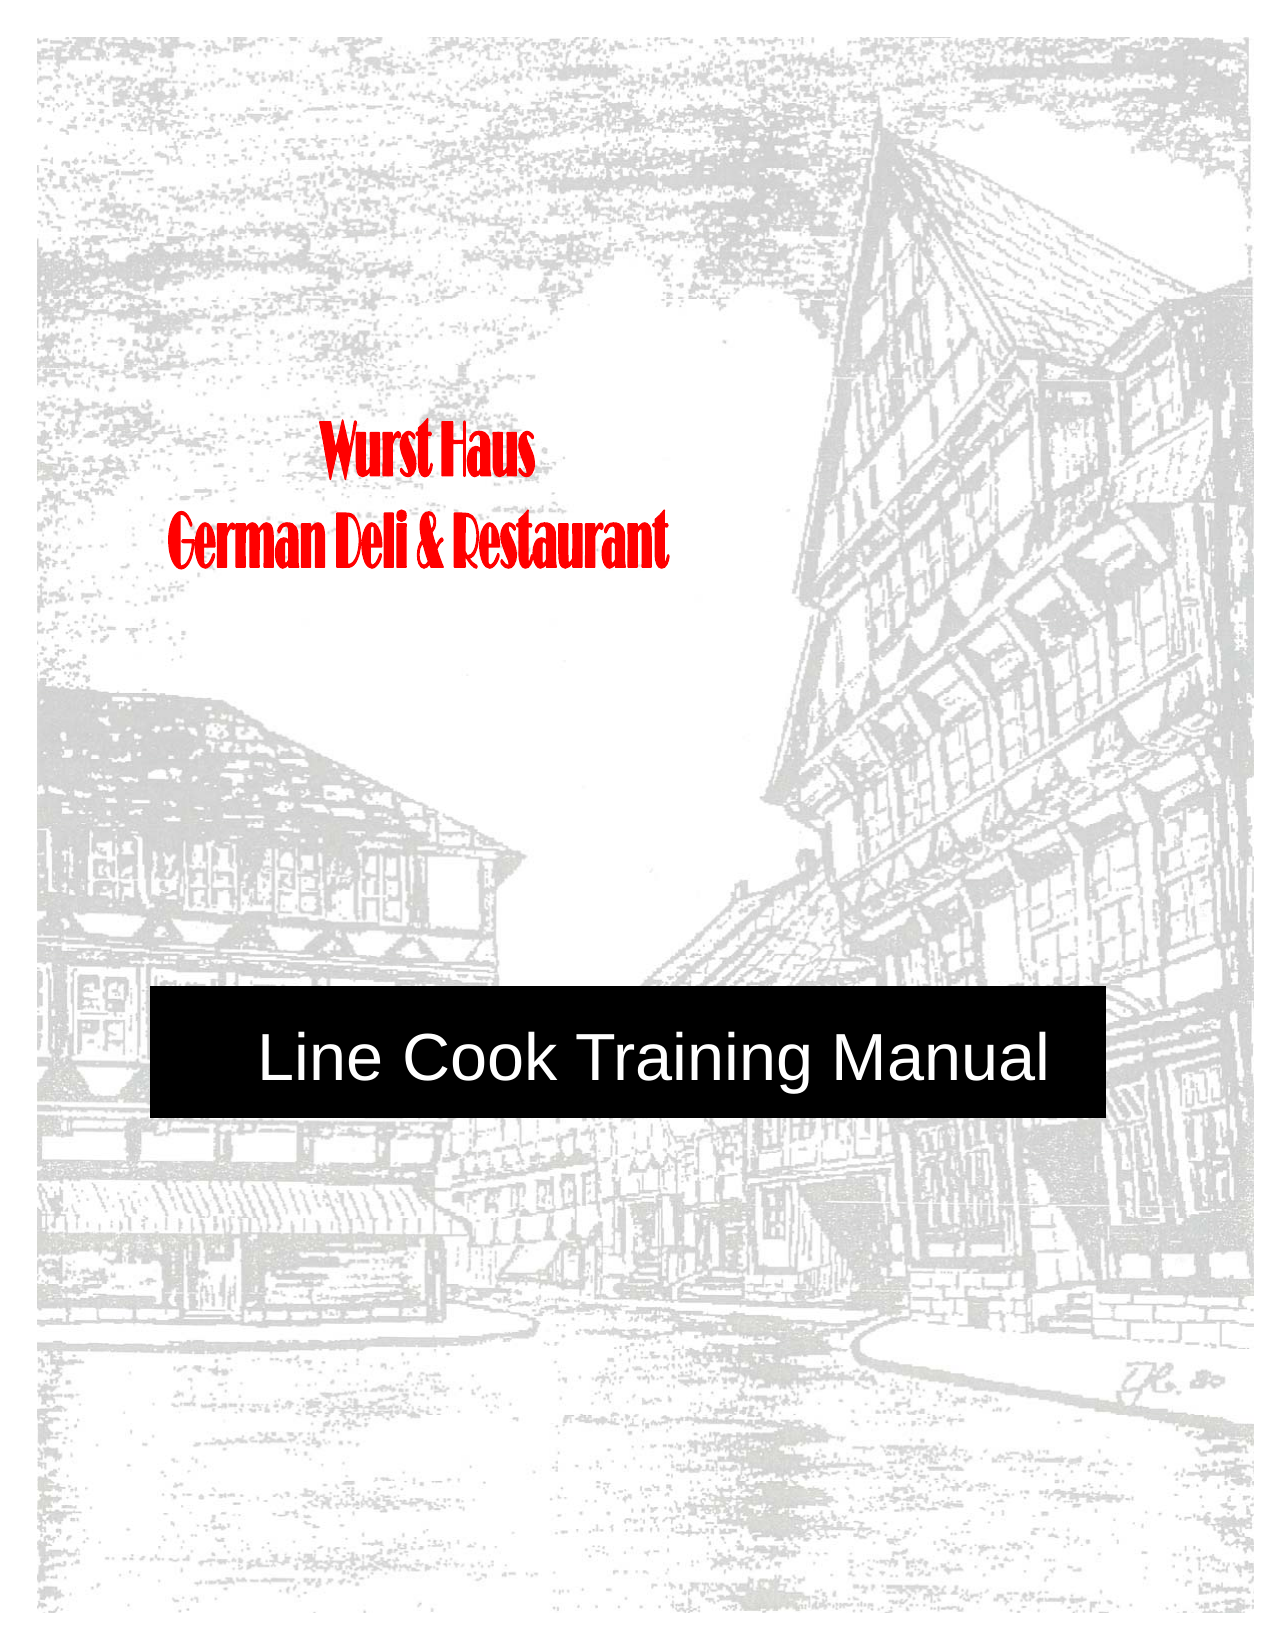 Line Cook Training Manual